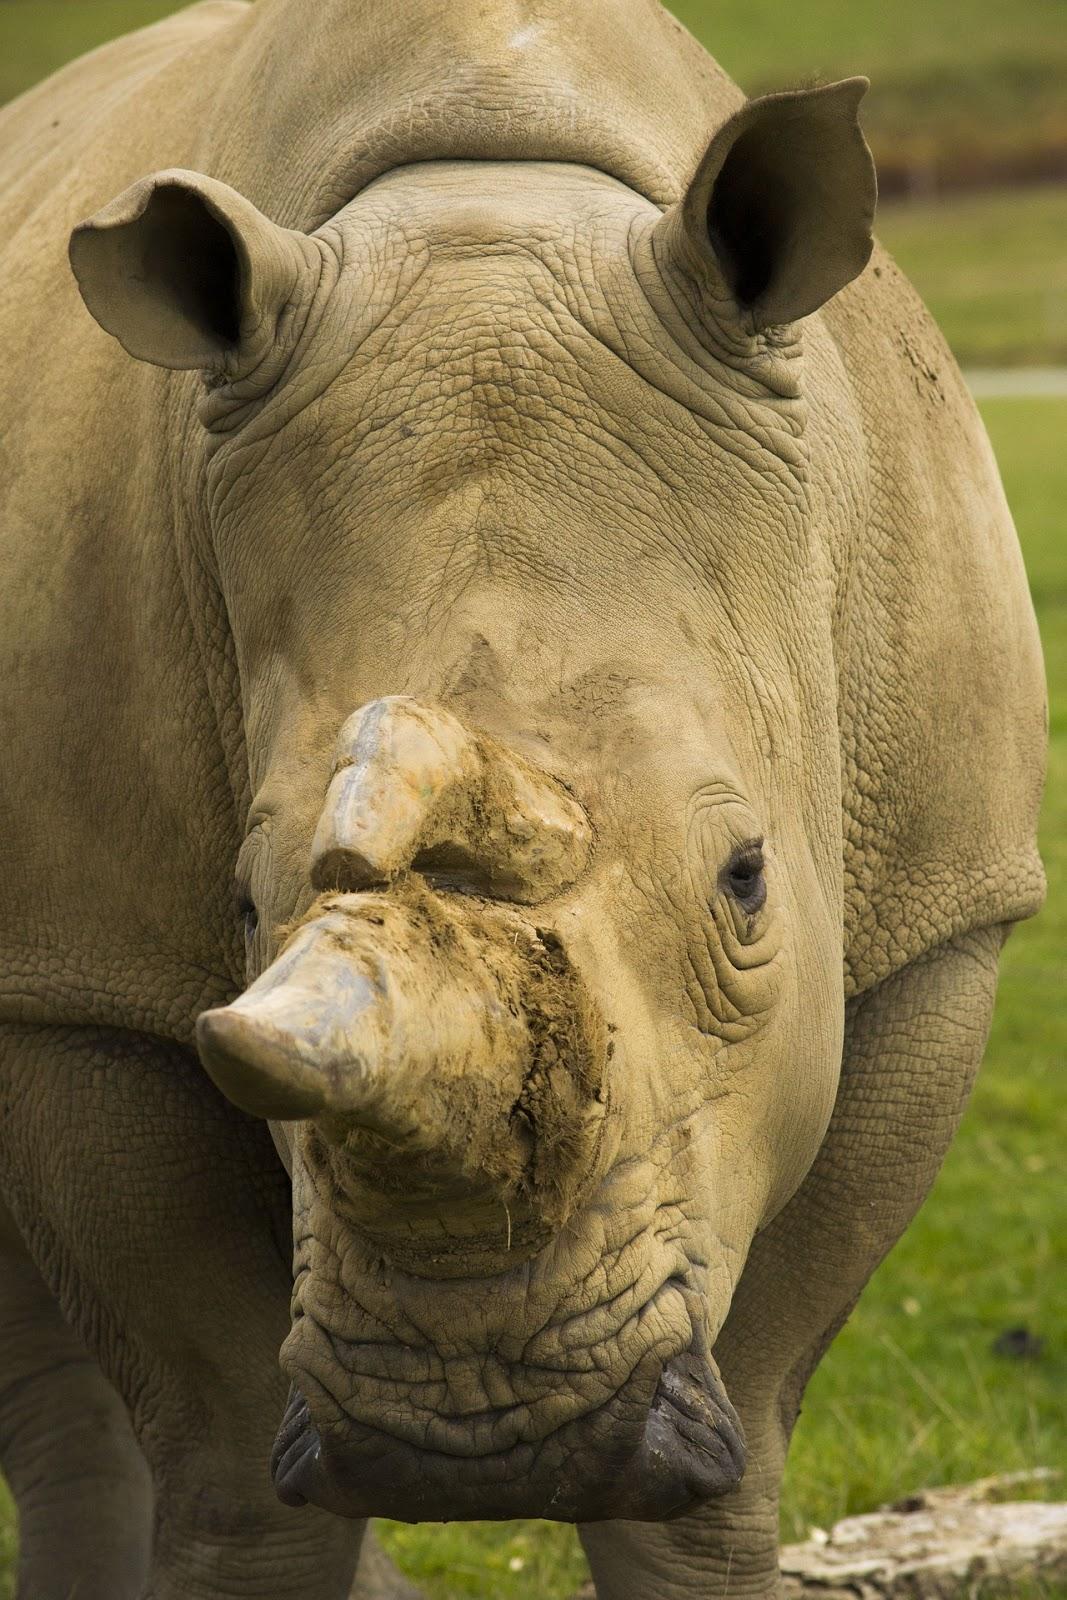 A charging rhino.